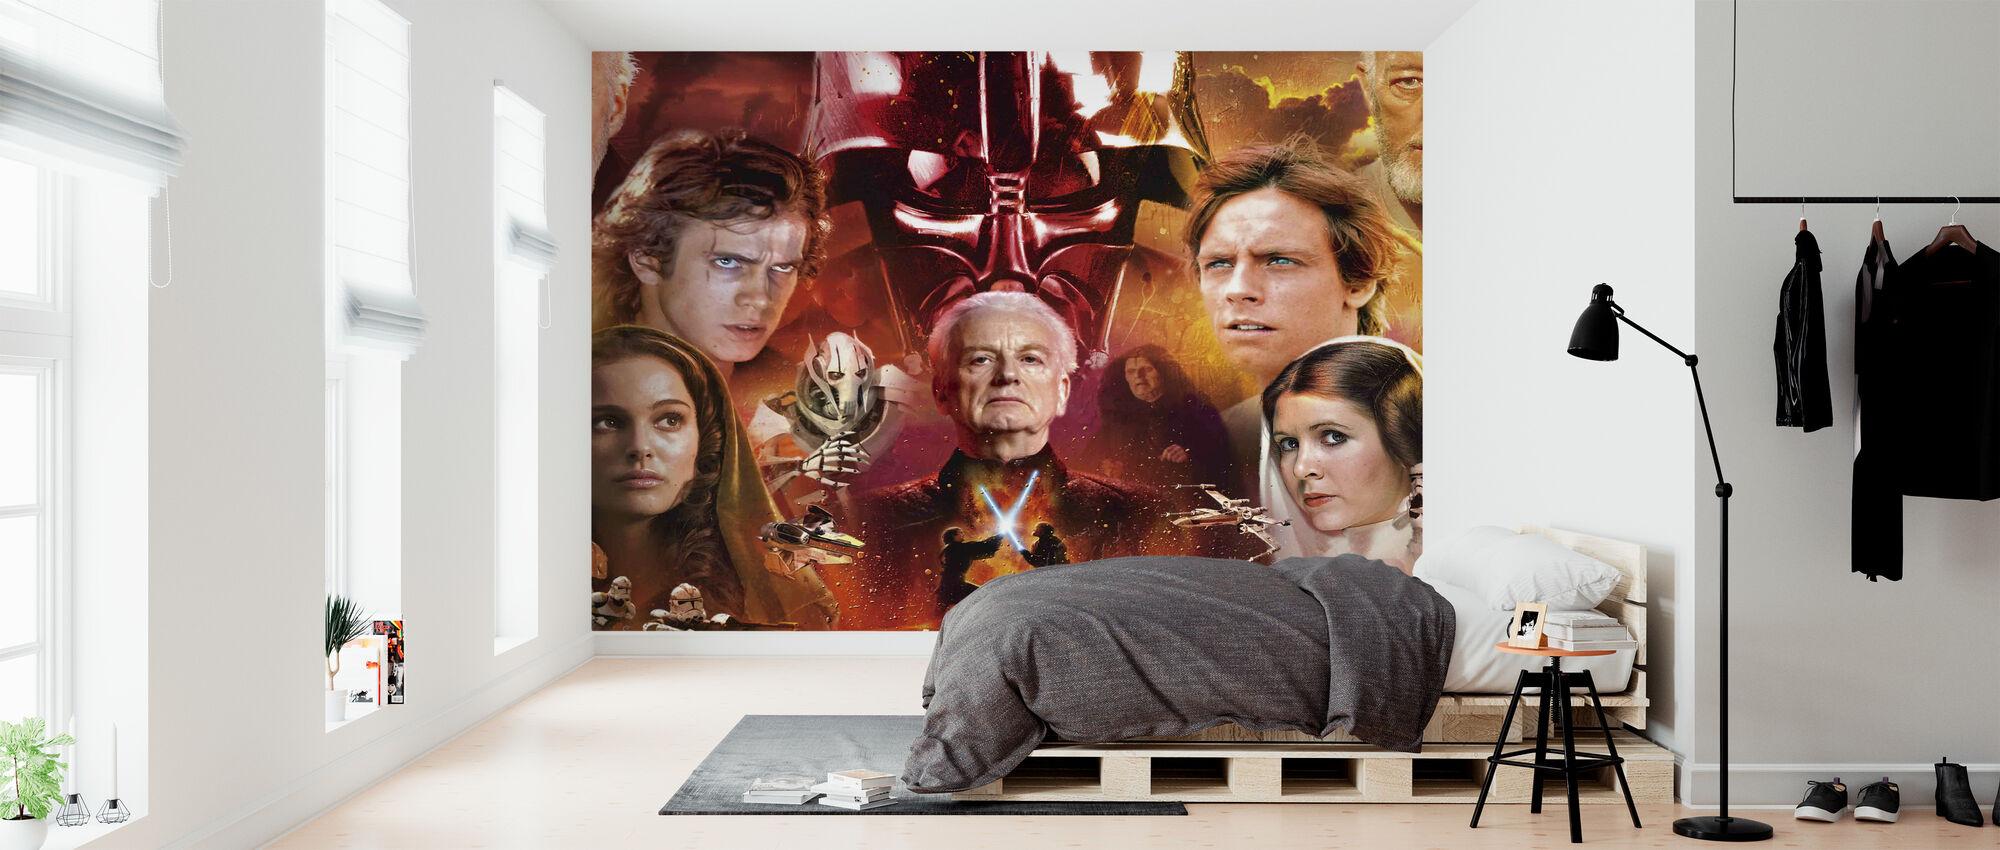 Star Wars - Collage - Tapet - Soverom